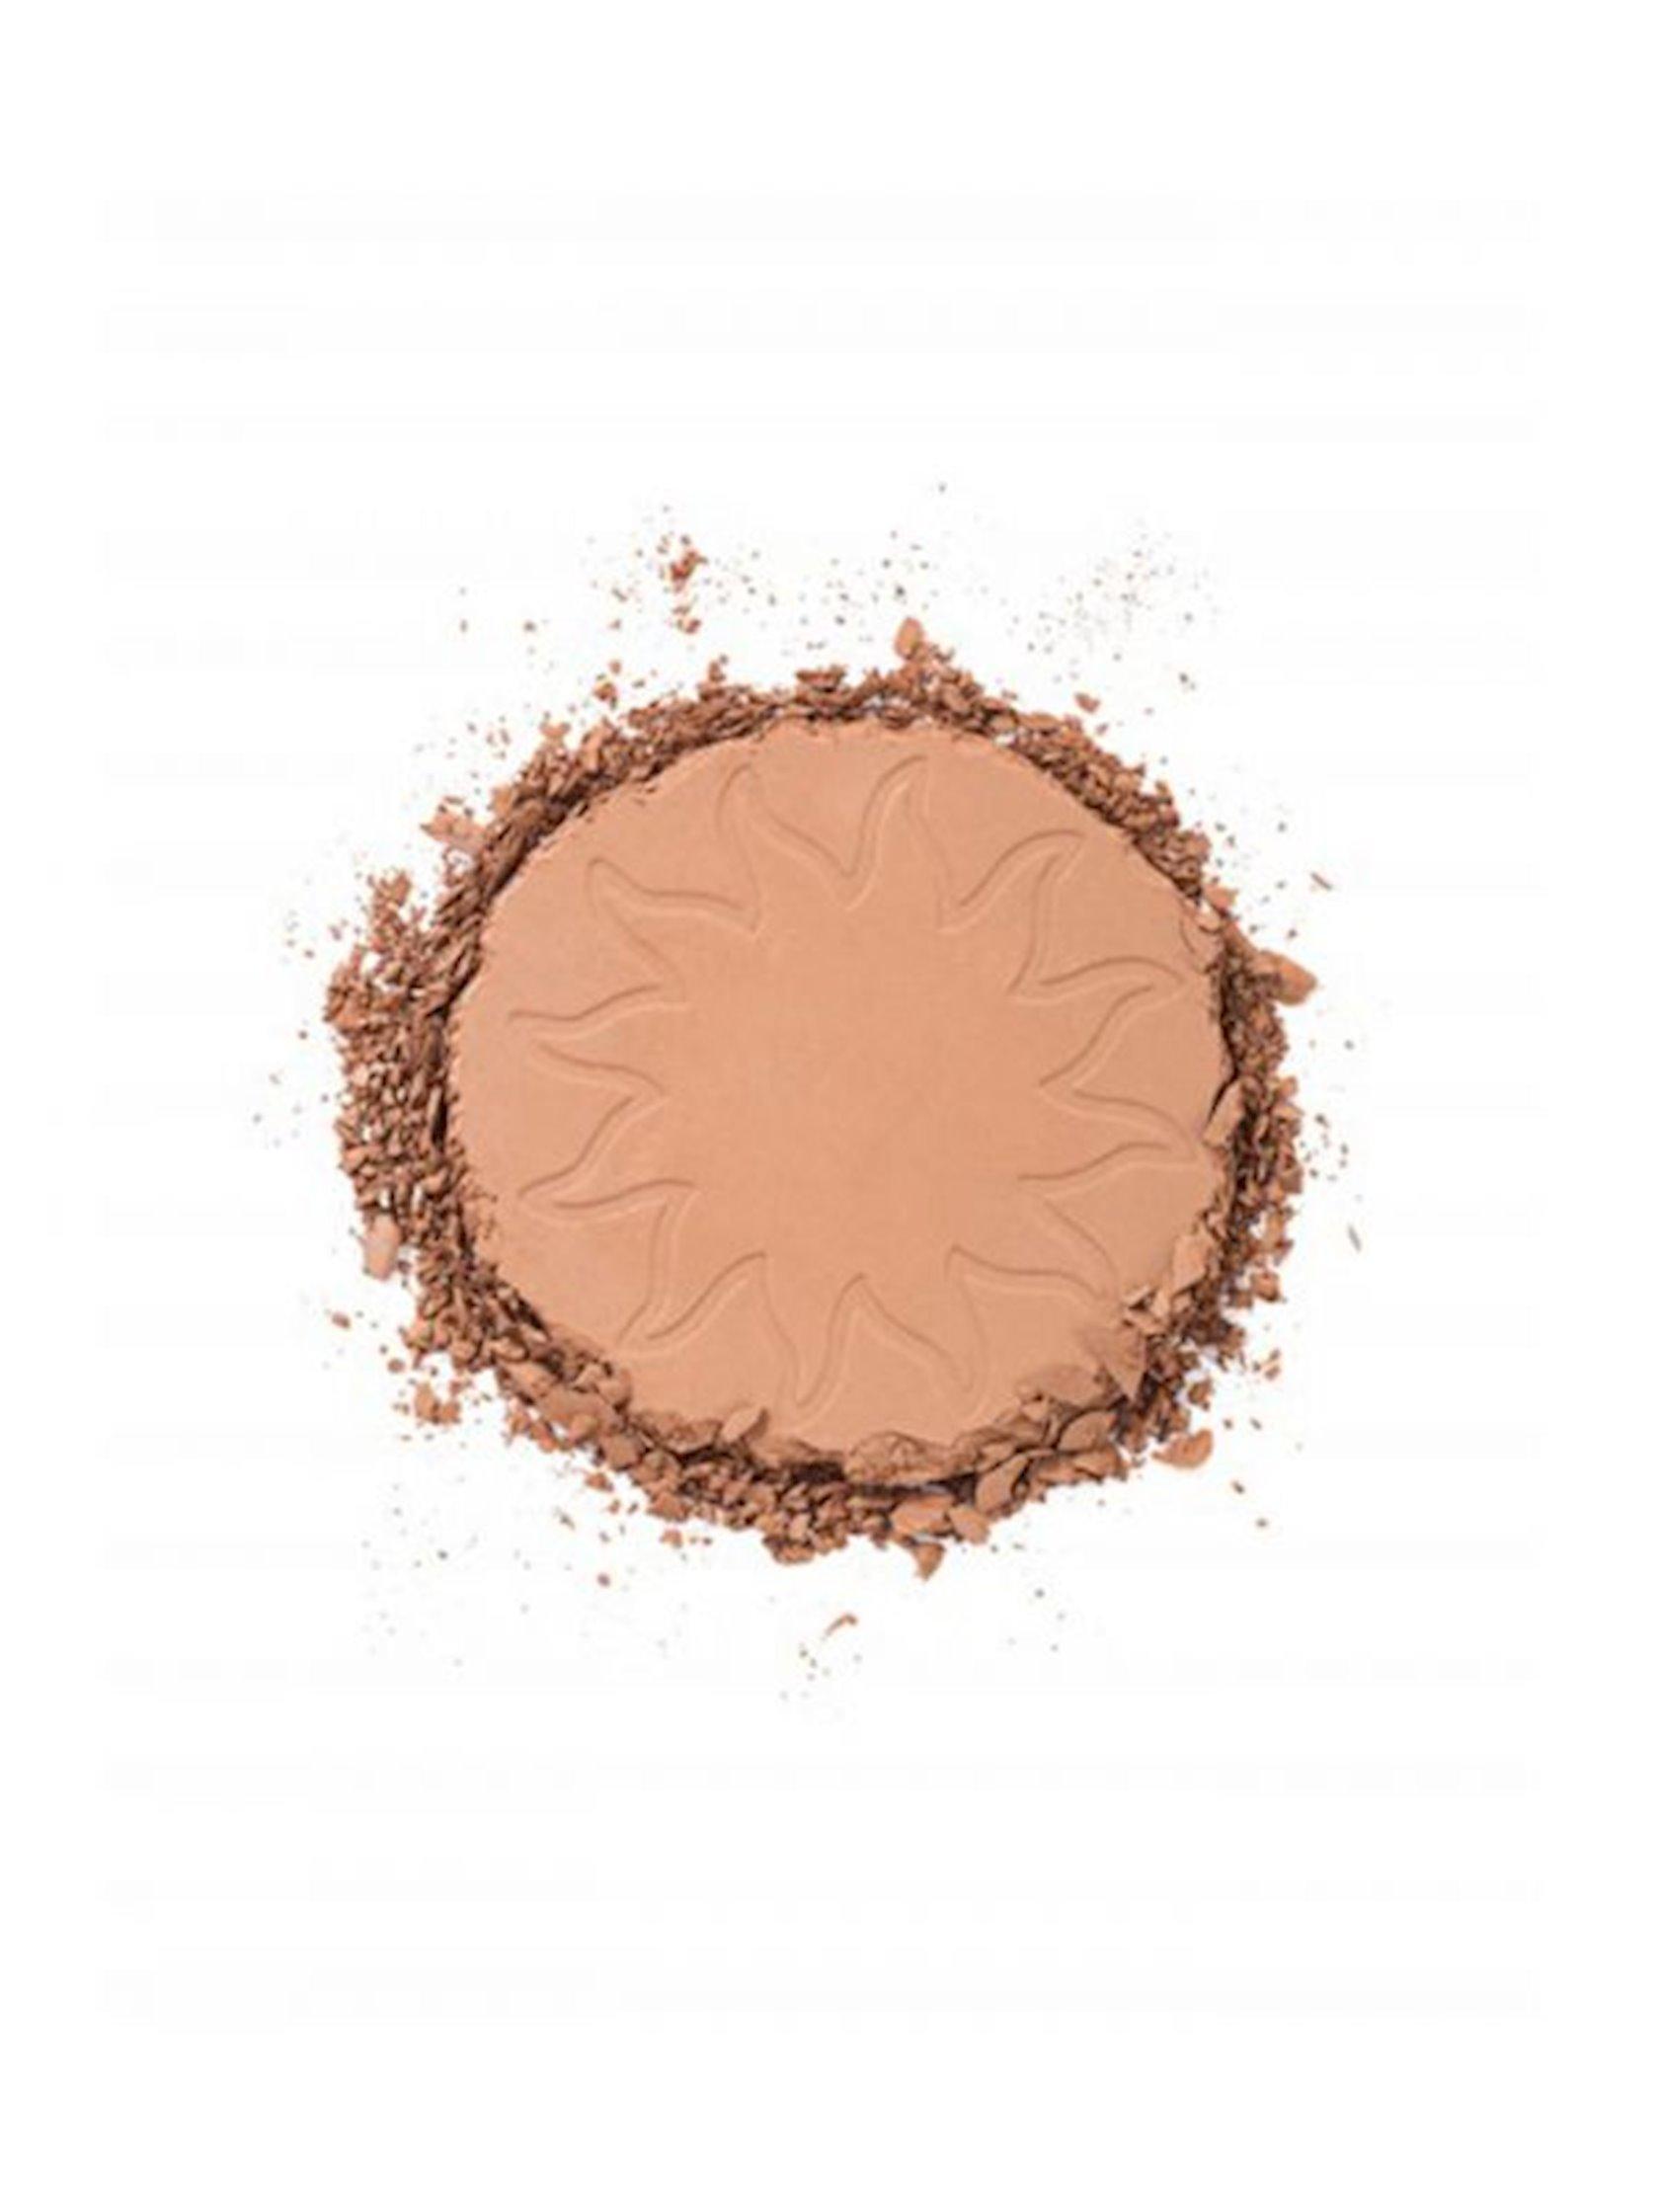 Bronz pudra Flormar Bronzing Powder Face & Body BR02 Gorgeous, 33g